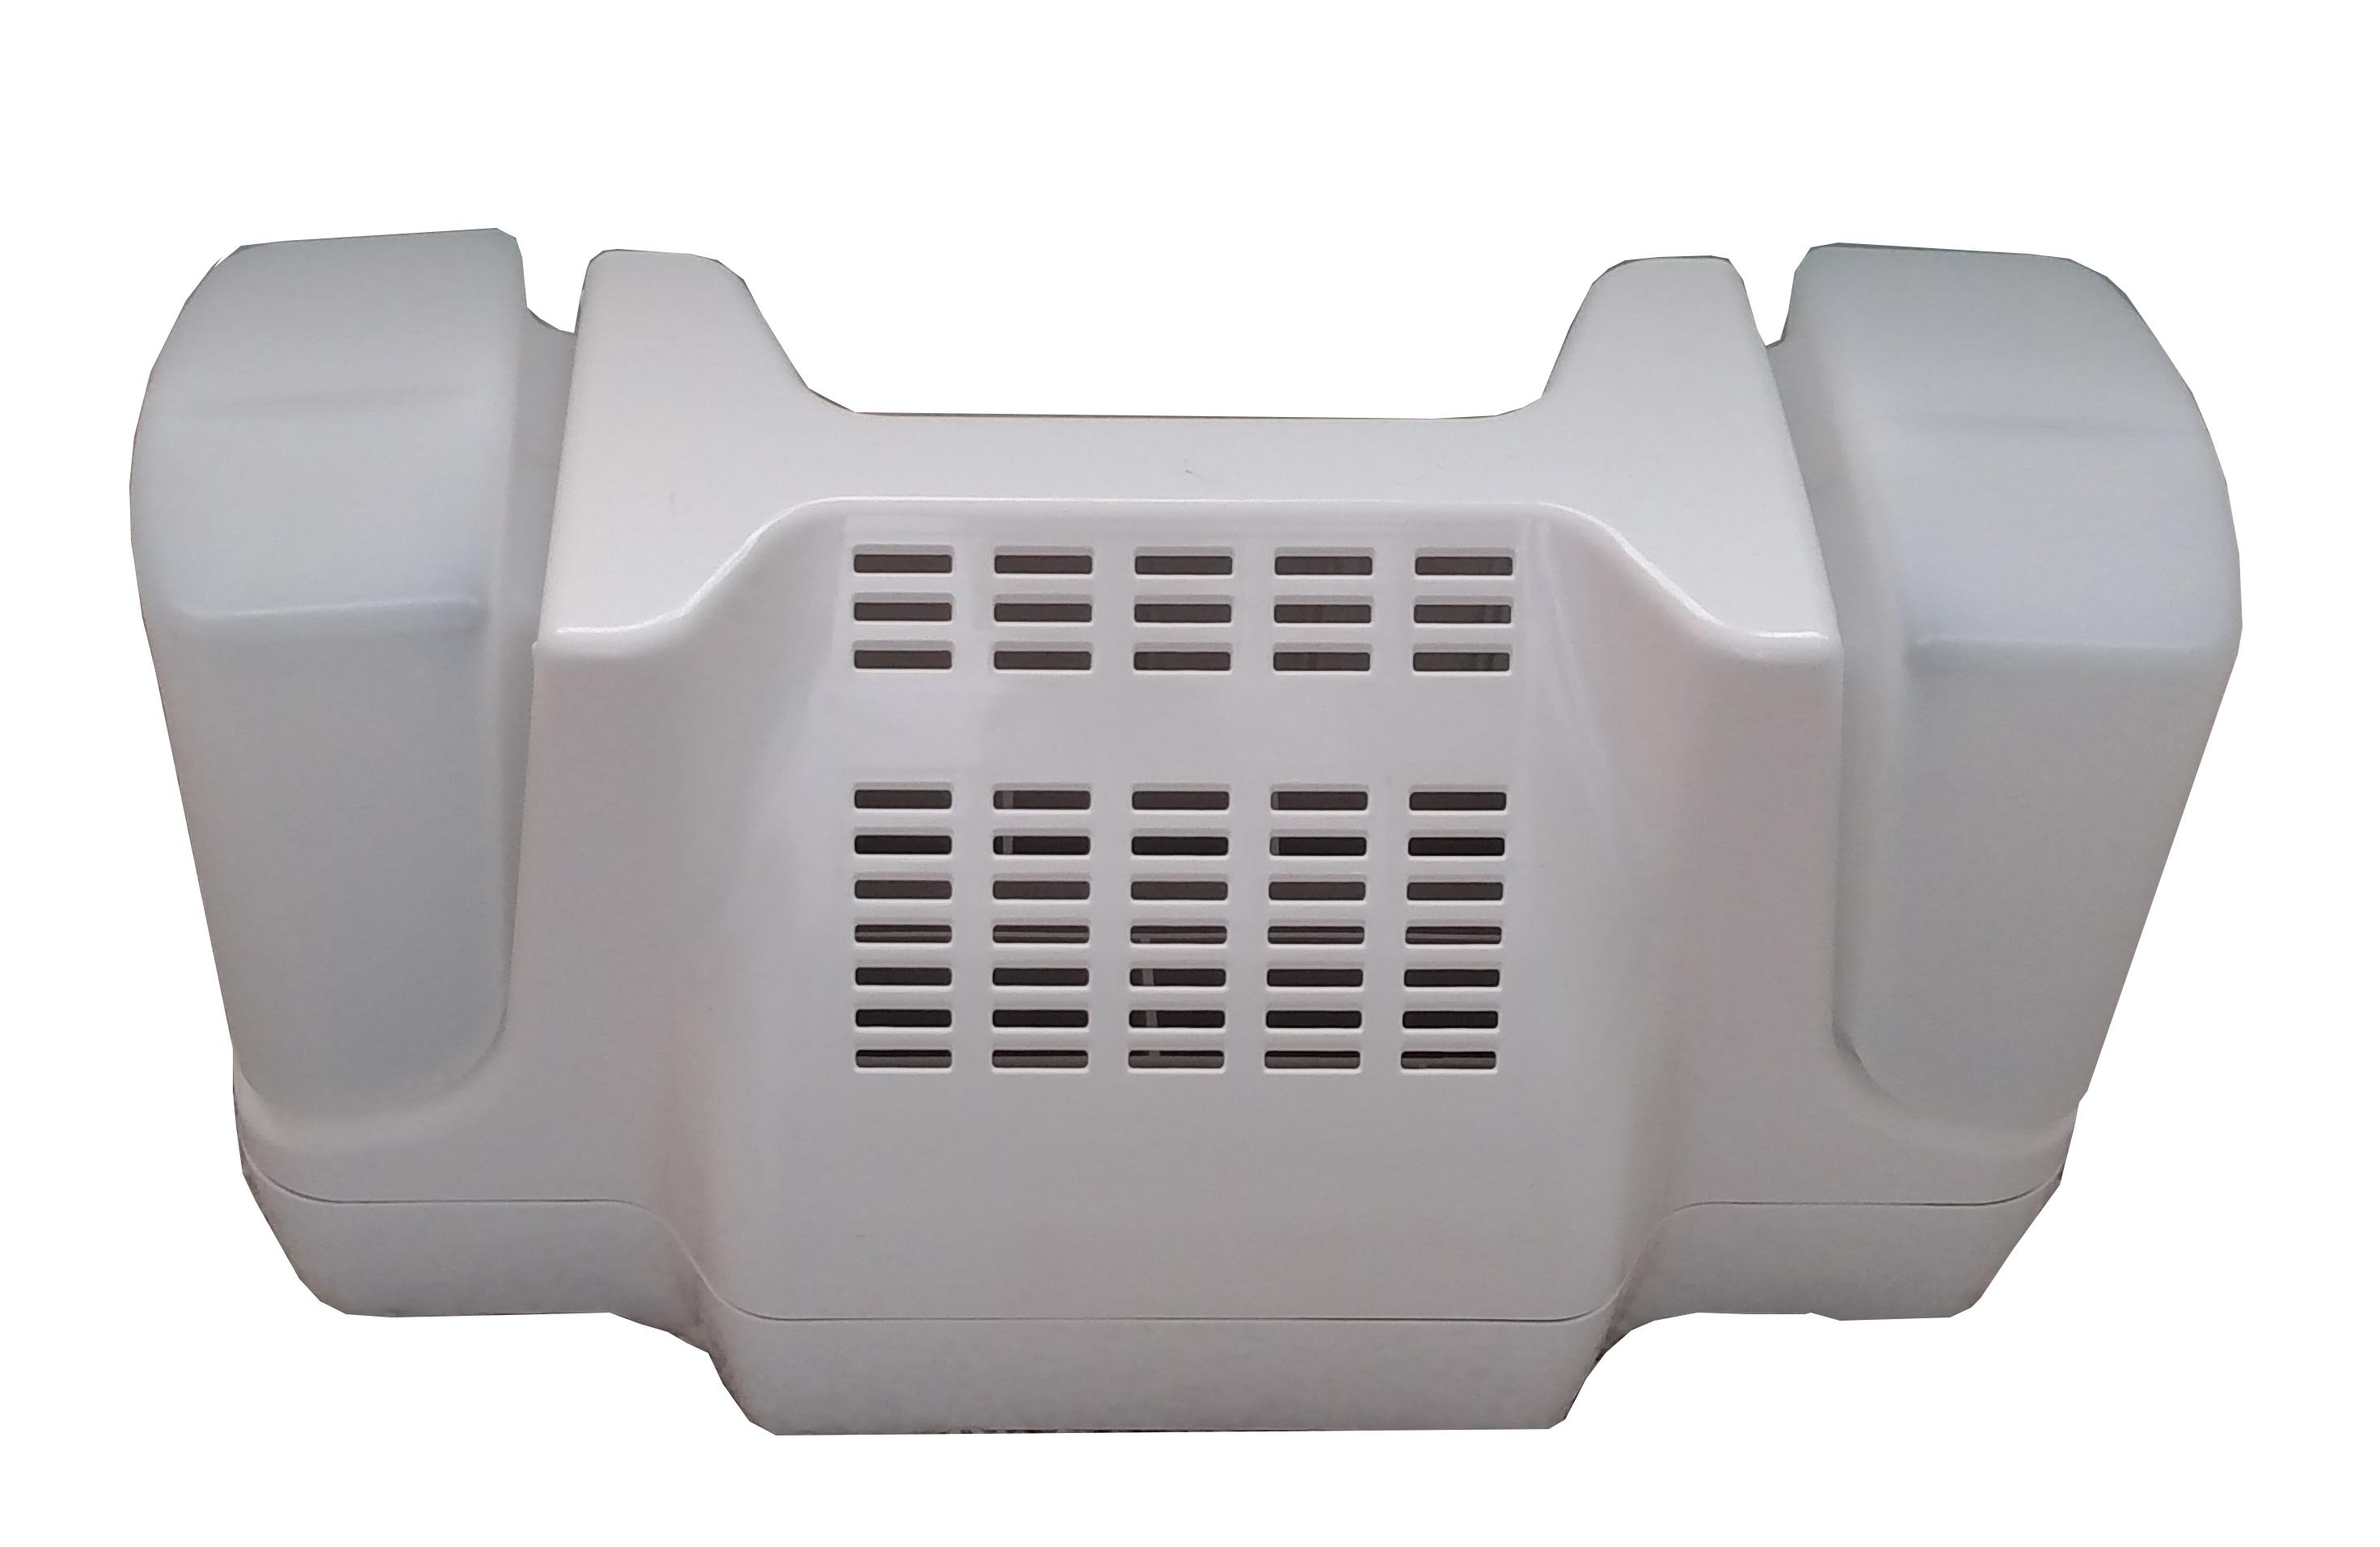 Eco Friendly Smart Portable Floor Vent Room Humidifier VSLVH10 #383030